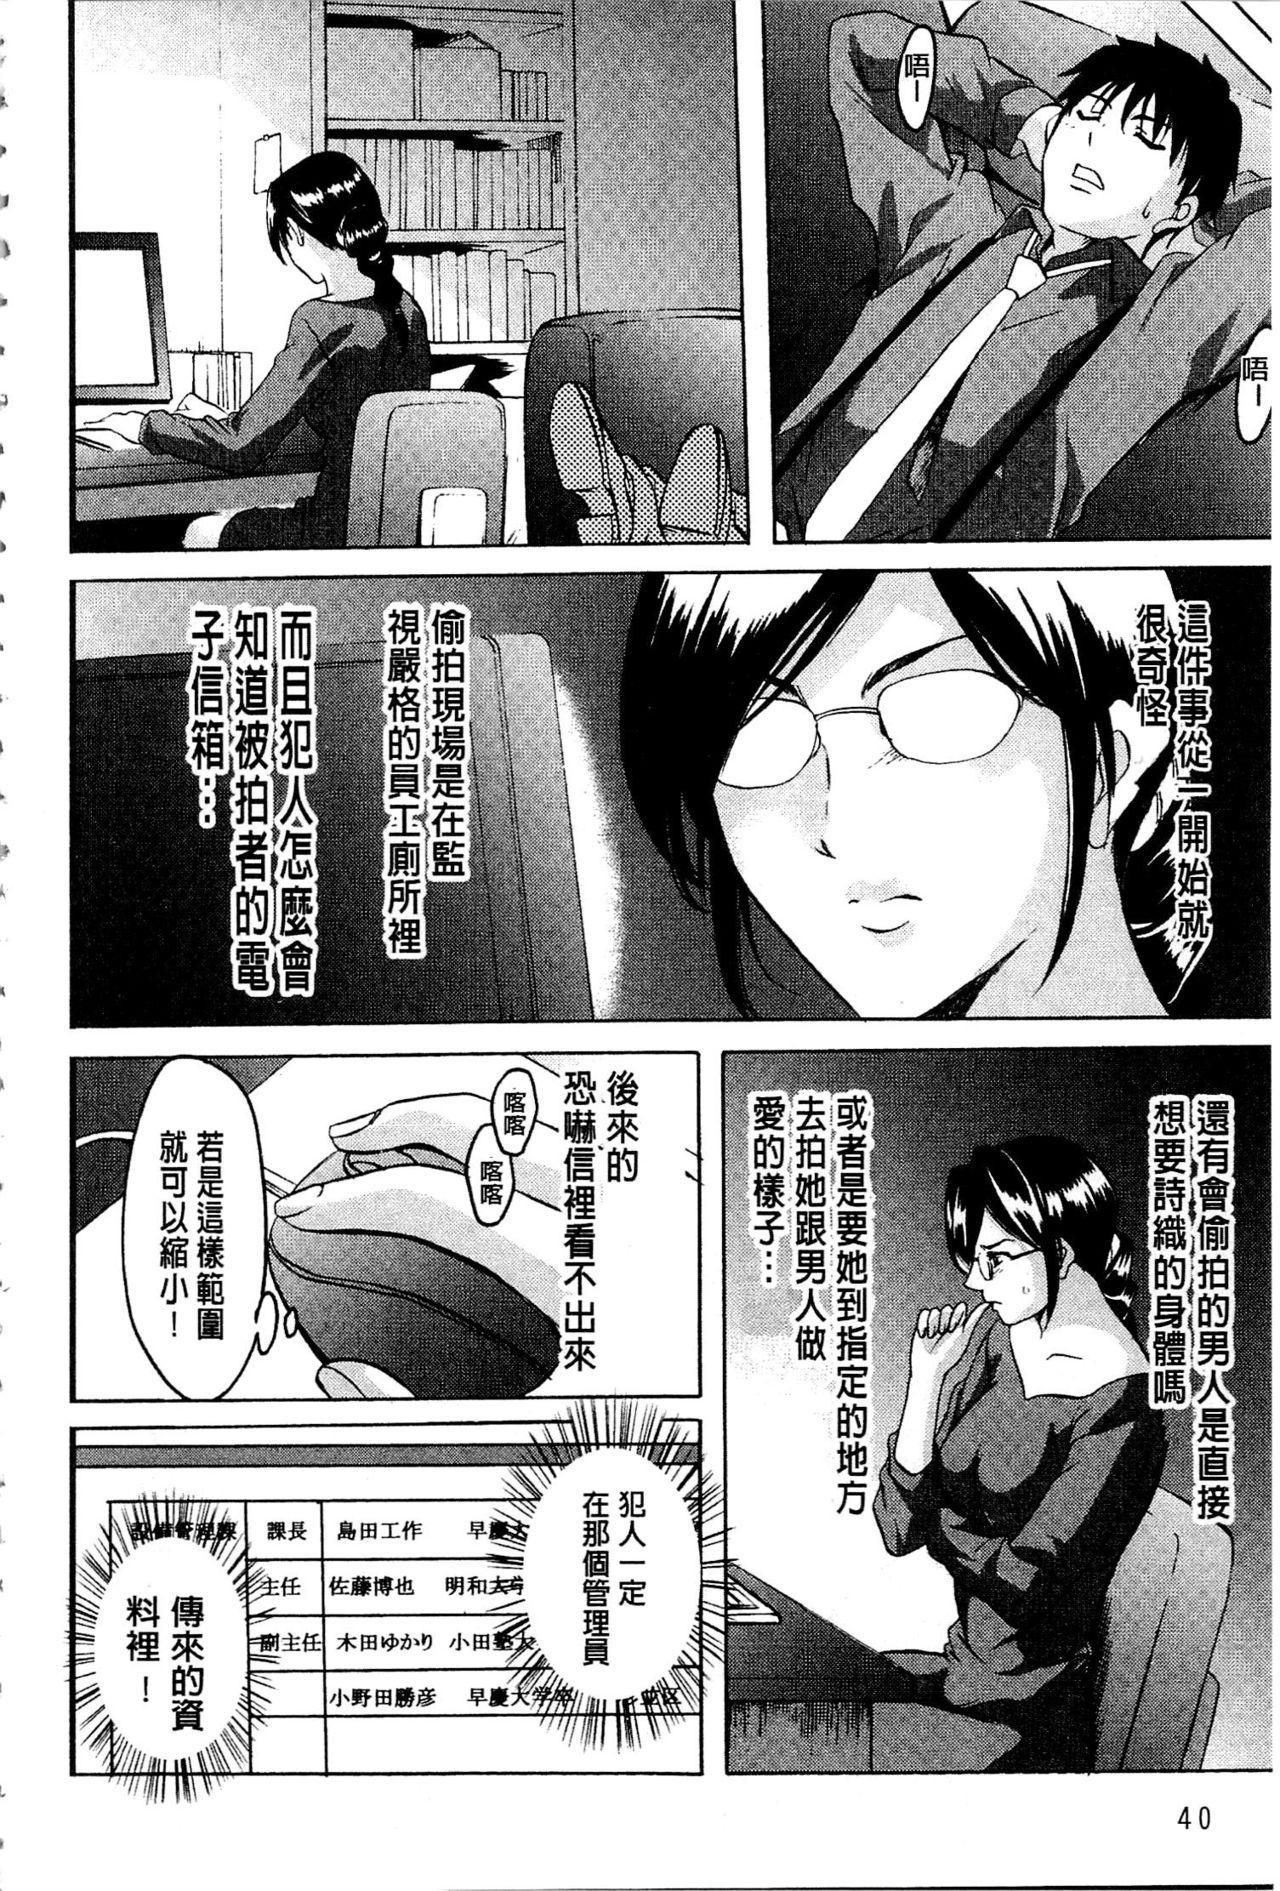 Sennyu Tsuma Satomi Kiroku | 臥底人妻里美 洗腦凌辱的記錄 上集 41